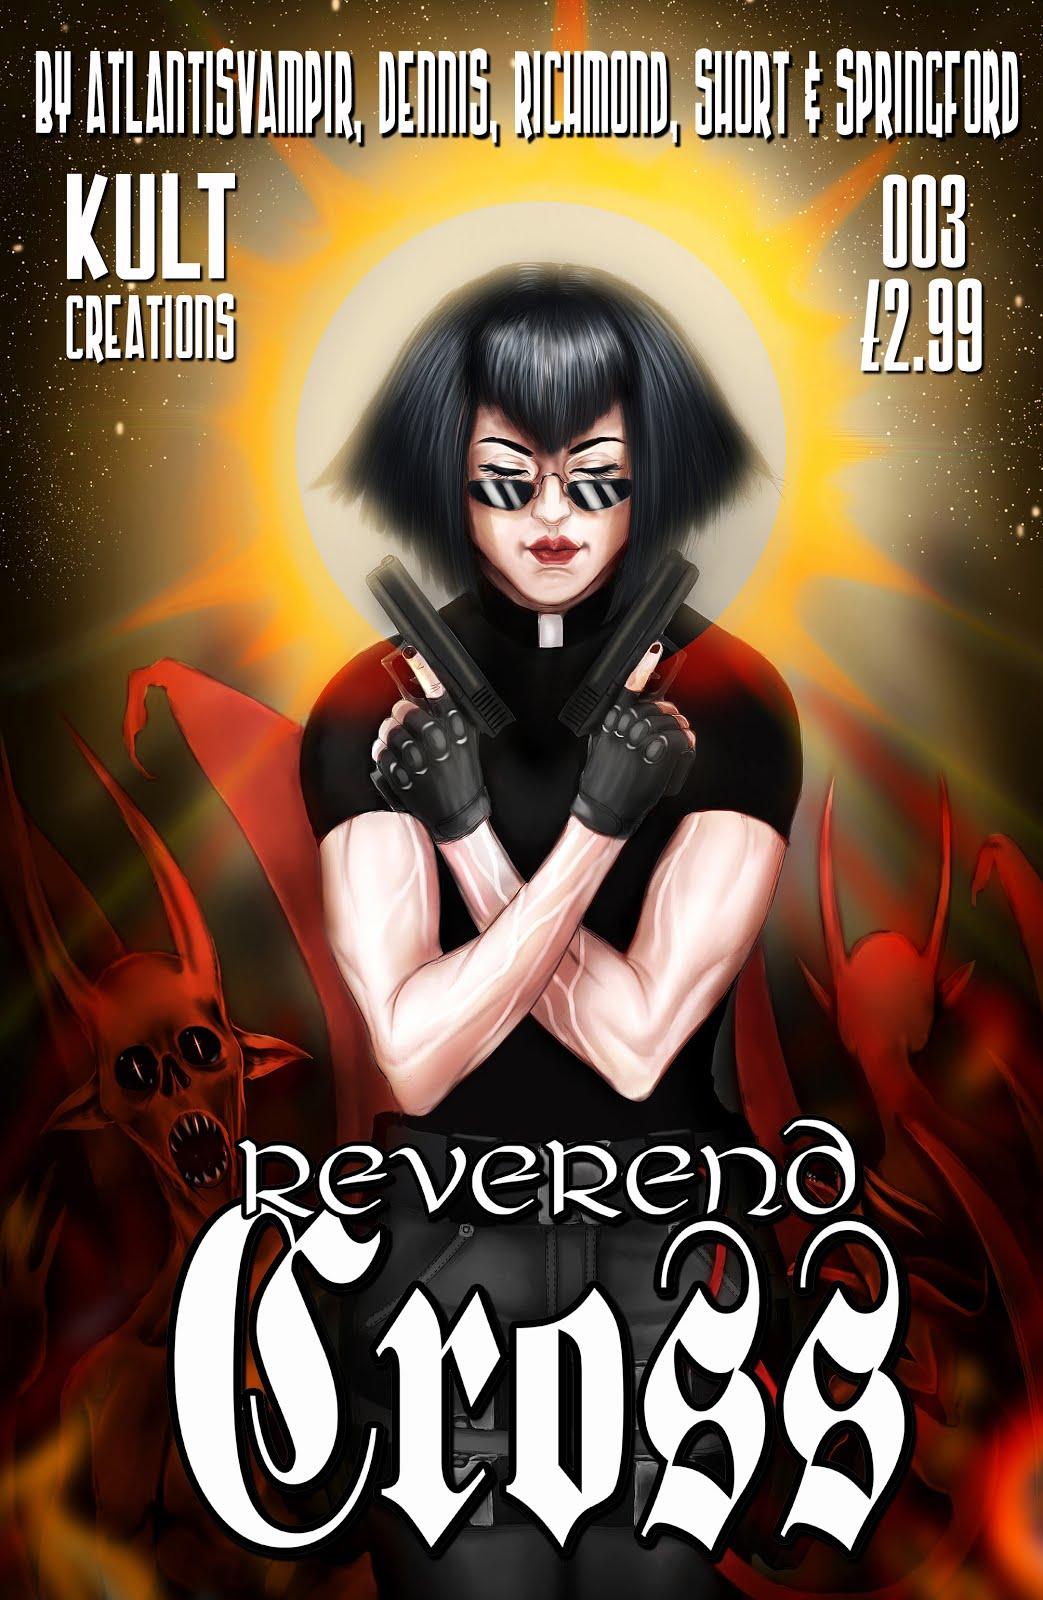 Buy REVEREND CROSS issue 003 BELOW!